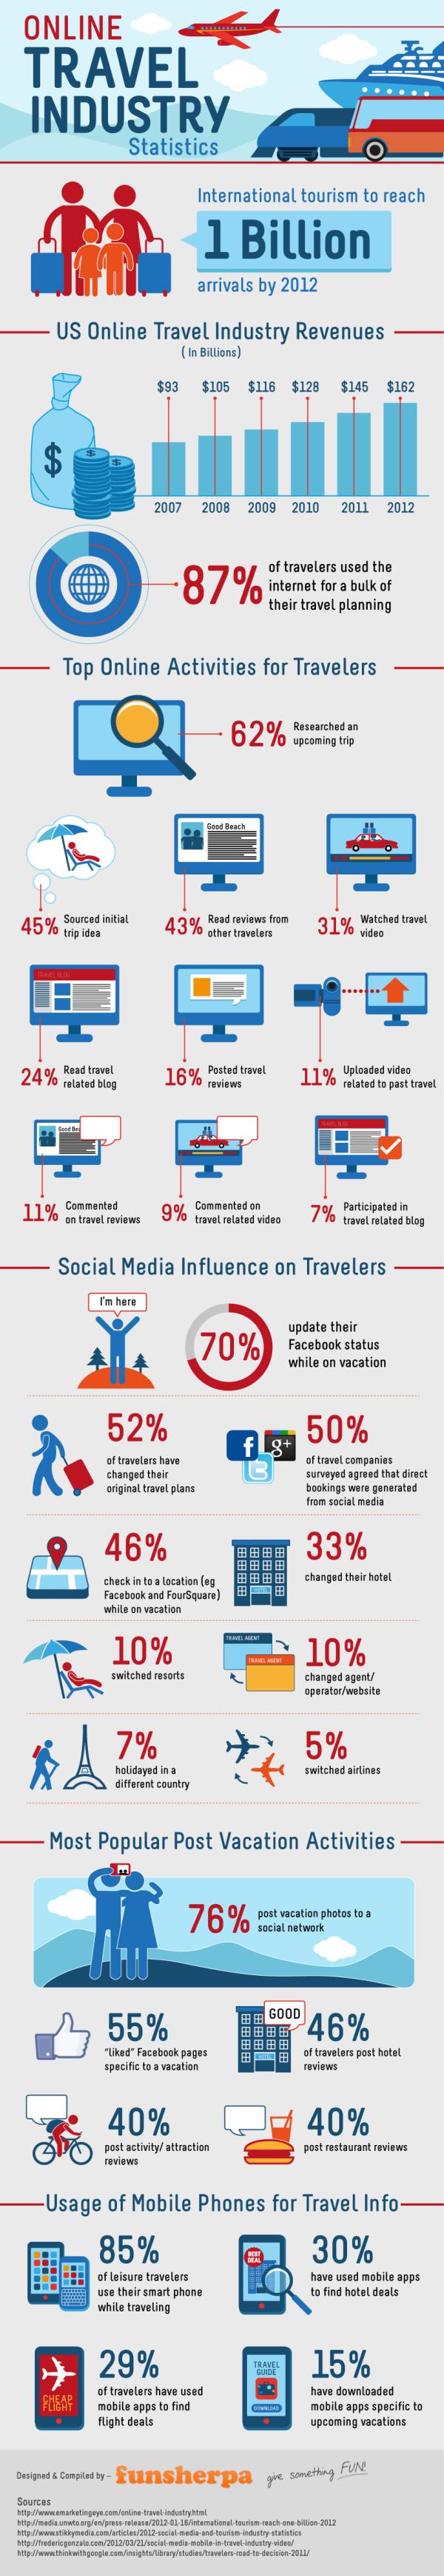 Online Travel Statistics 2012-Infographic